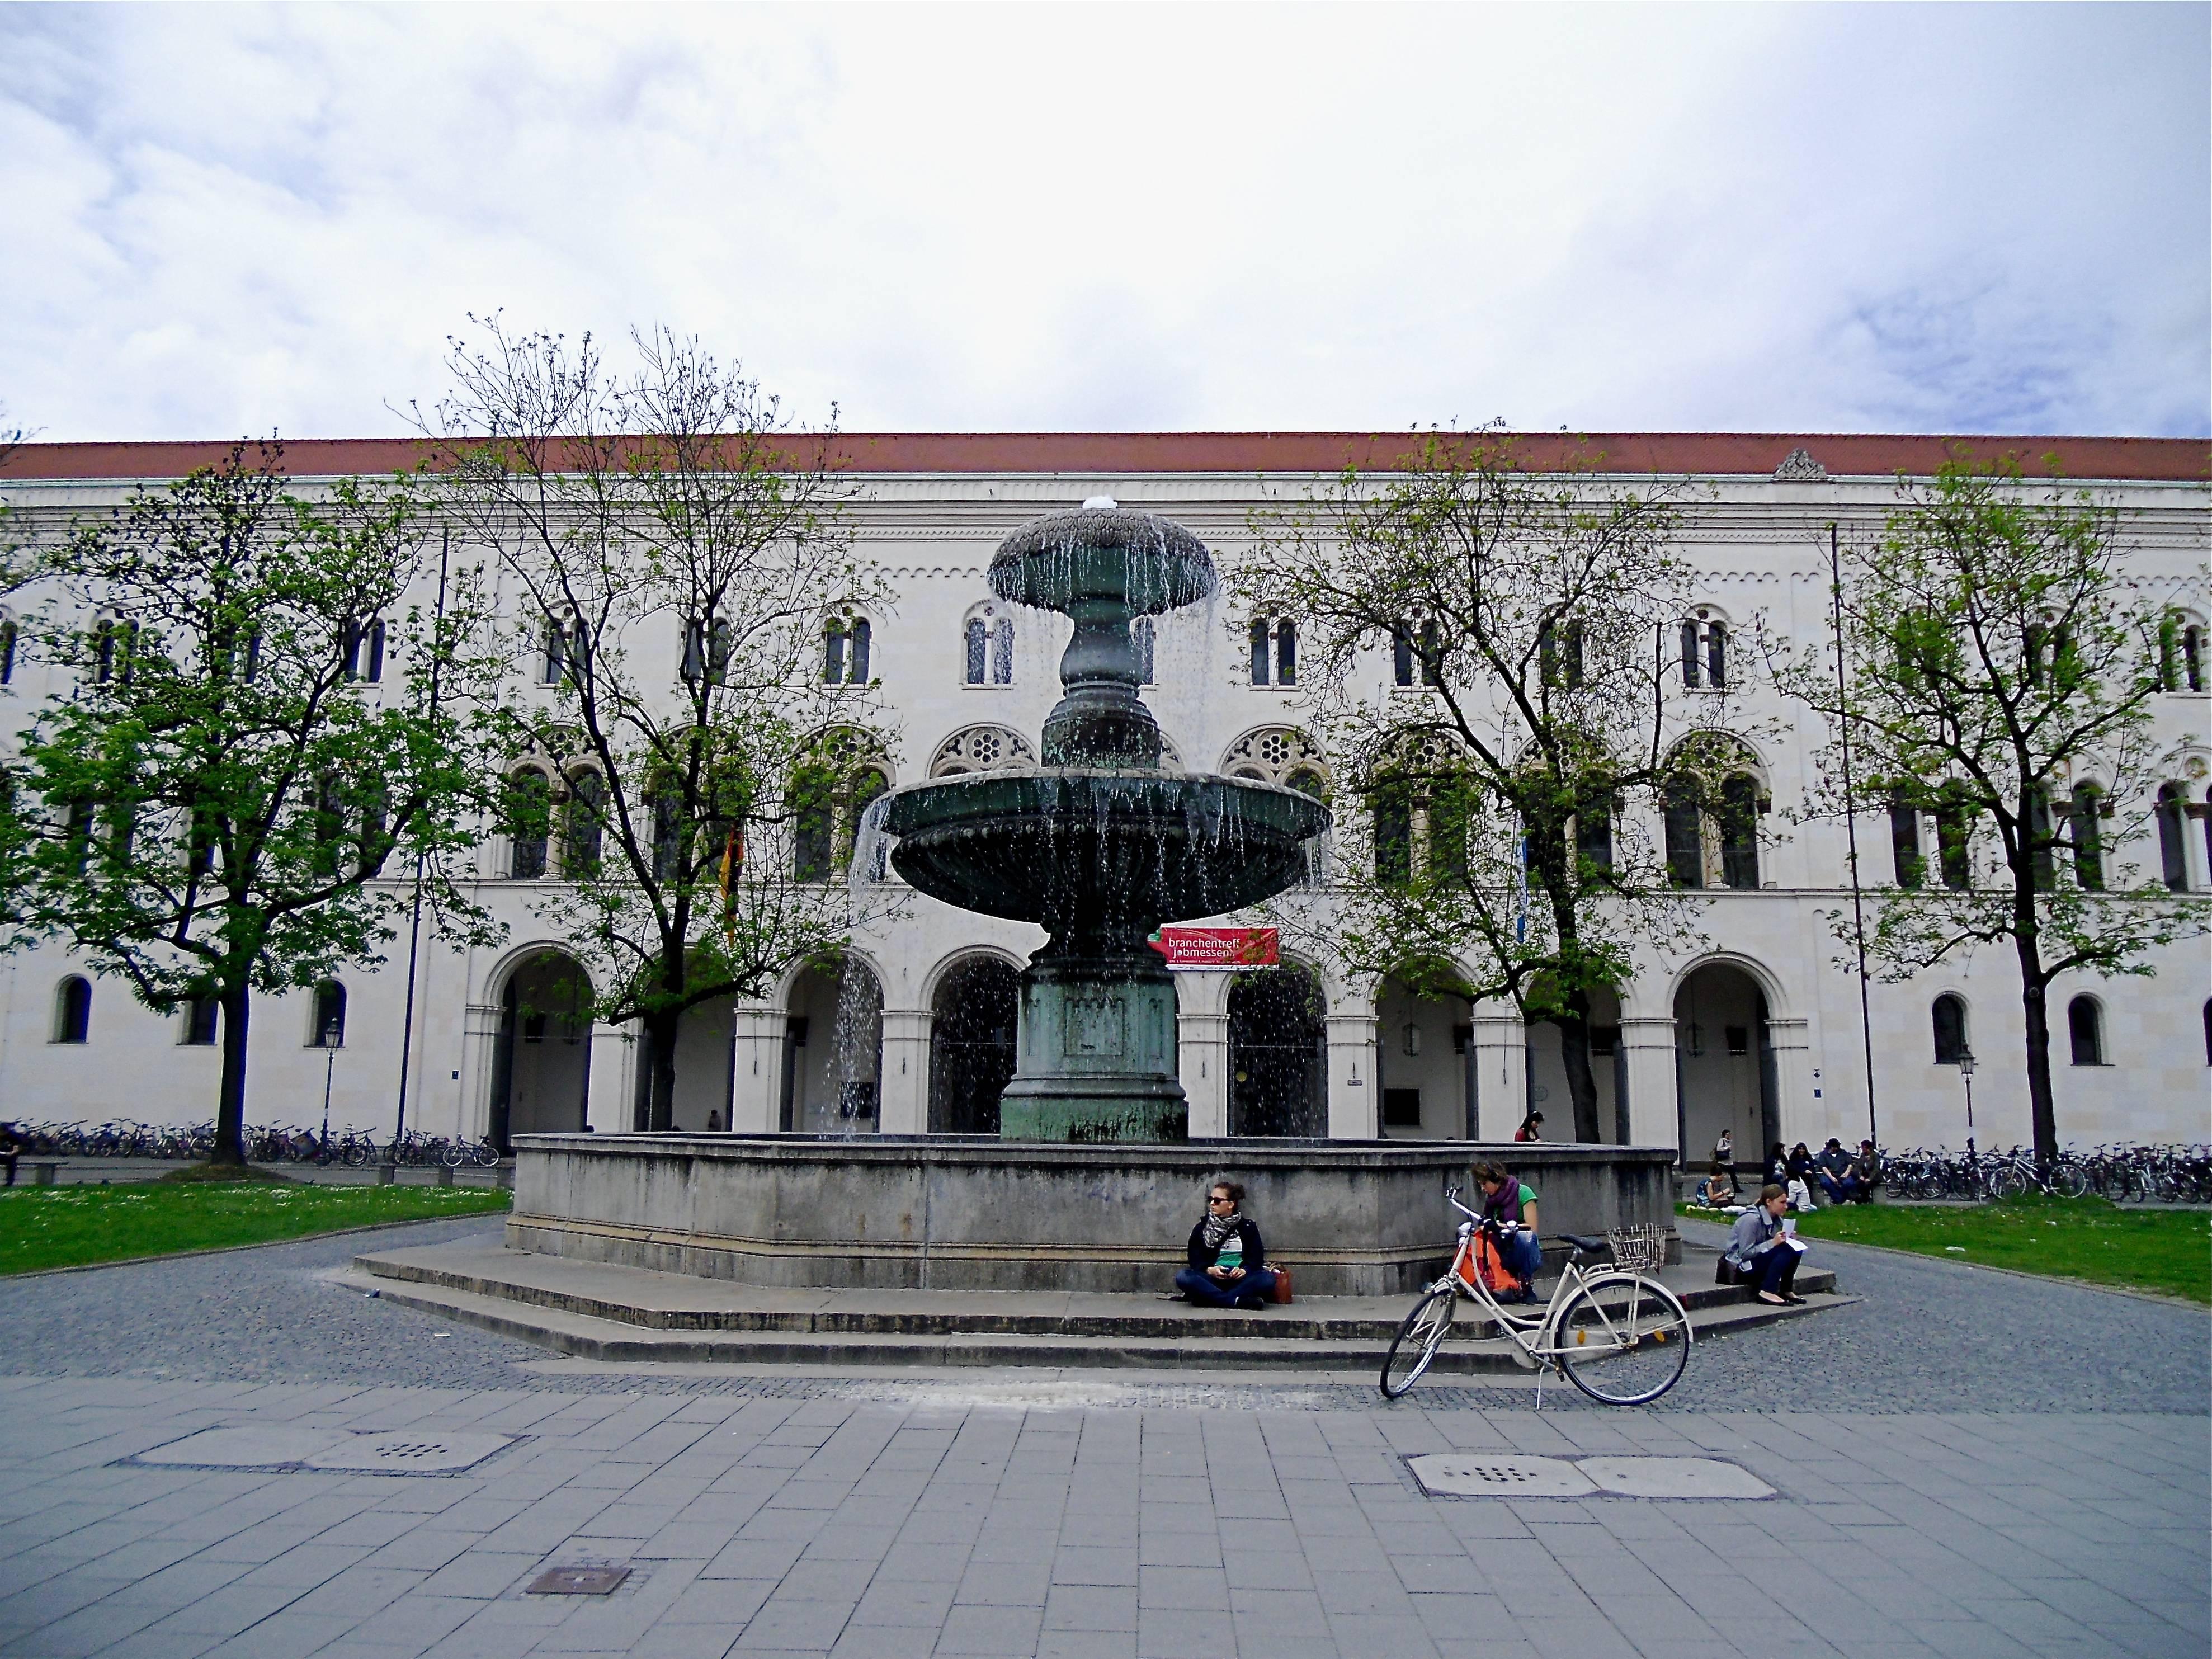 Мюнхенский университет людвига-максимилиана | ludwig-maximilians-universität münchen | lmu